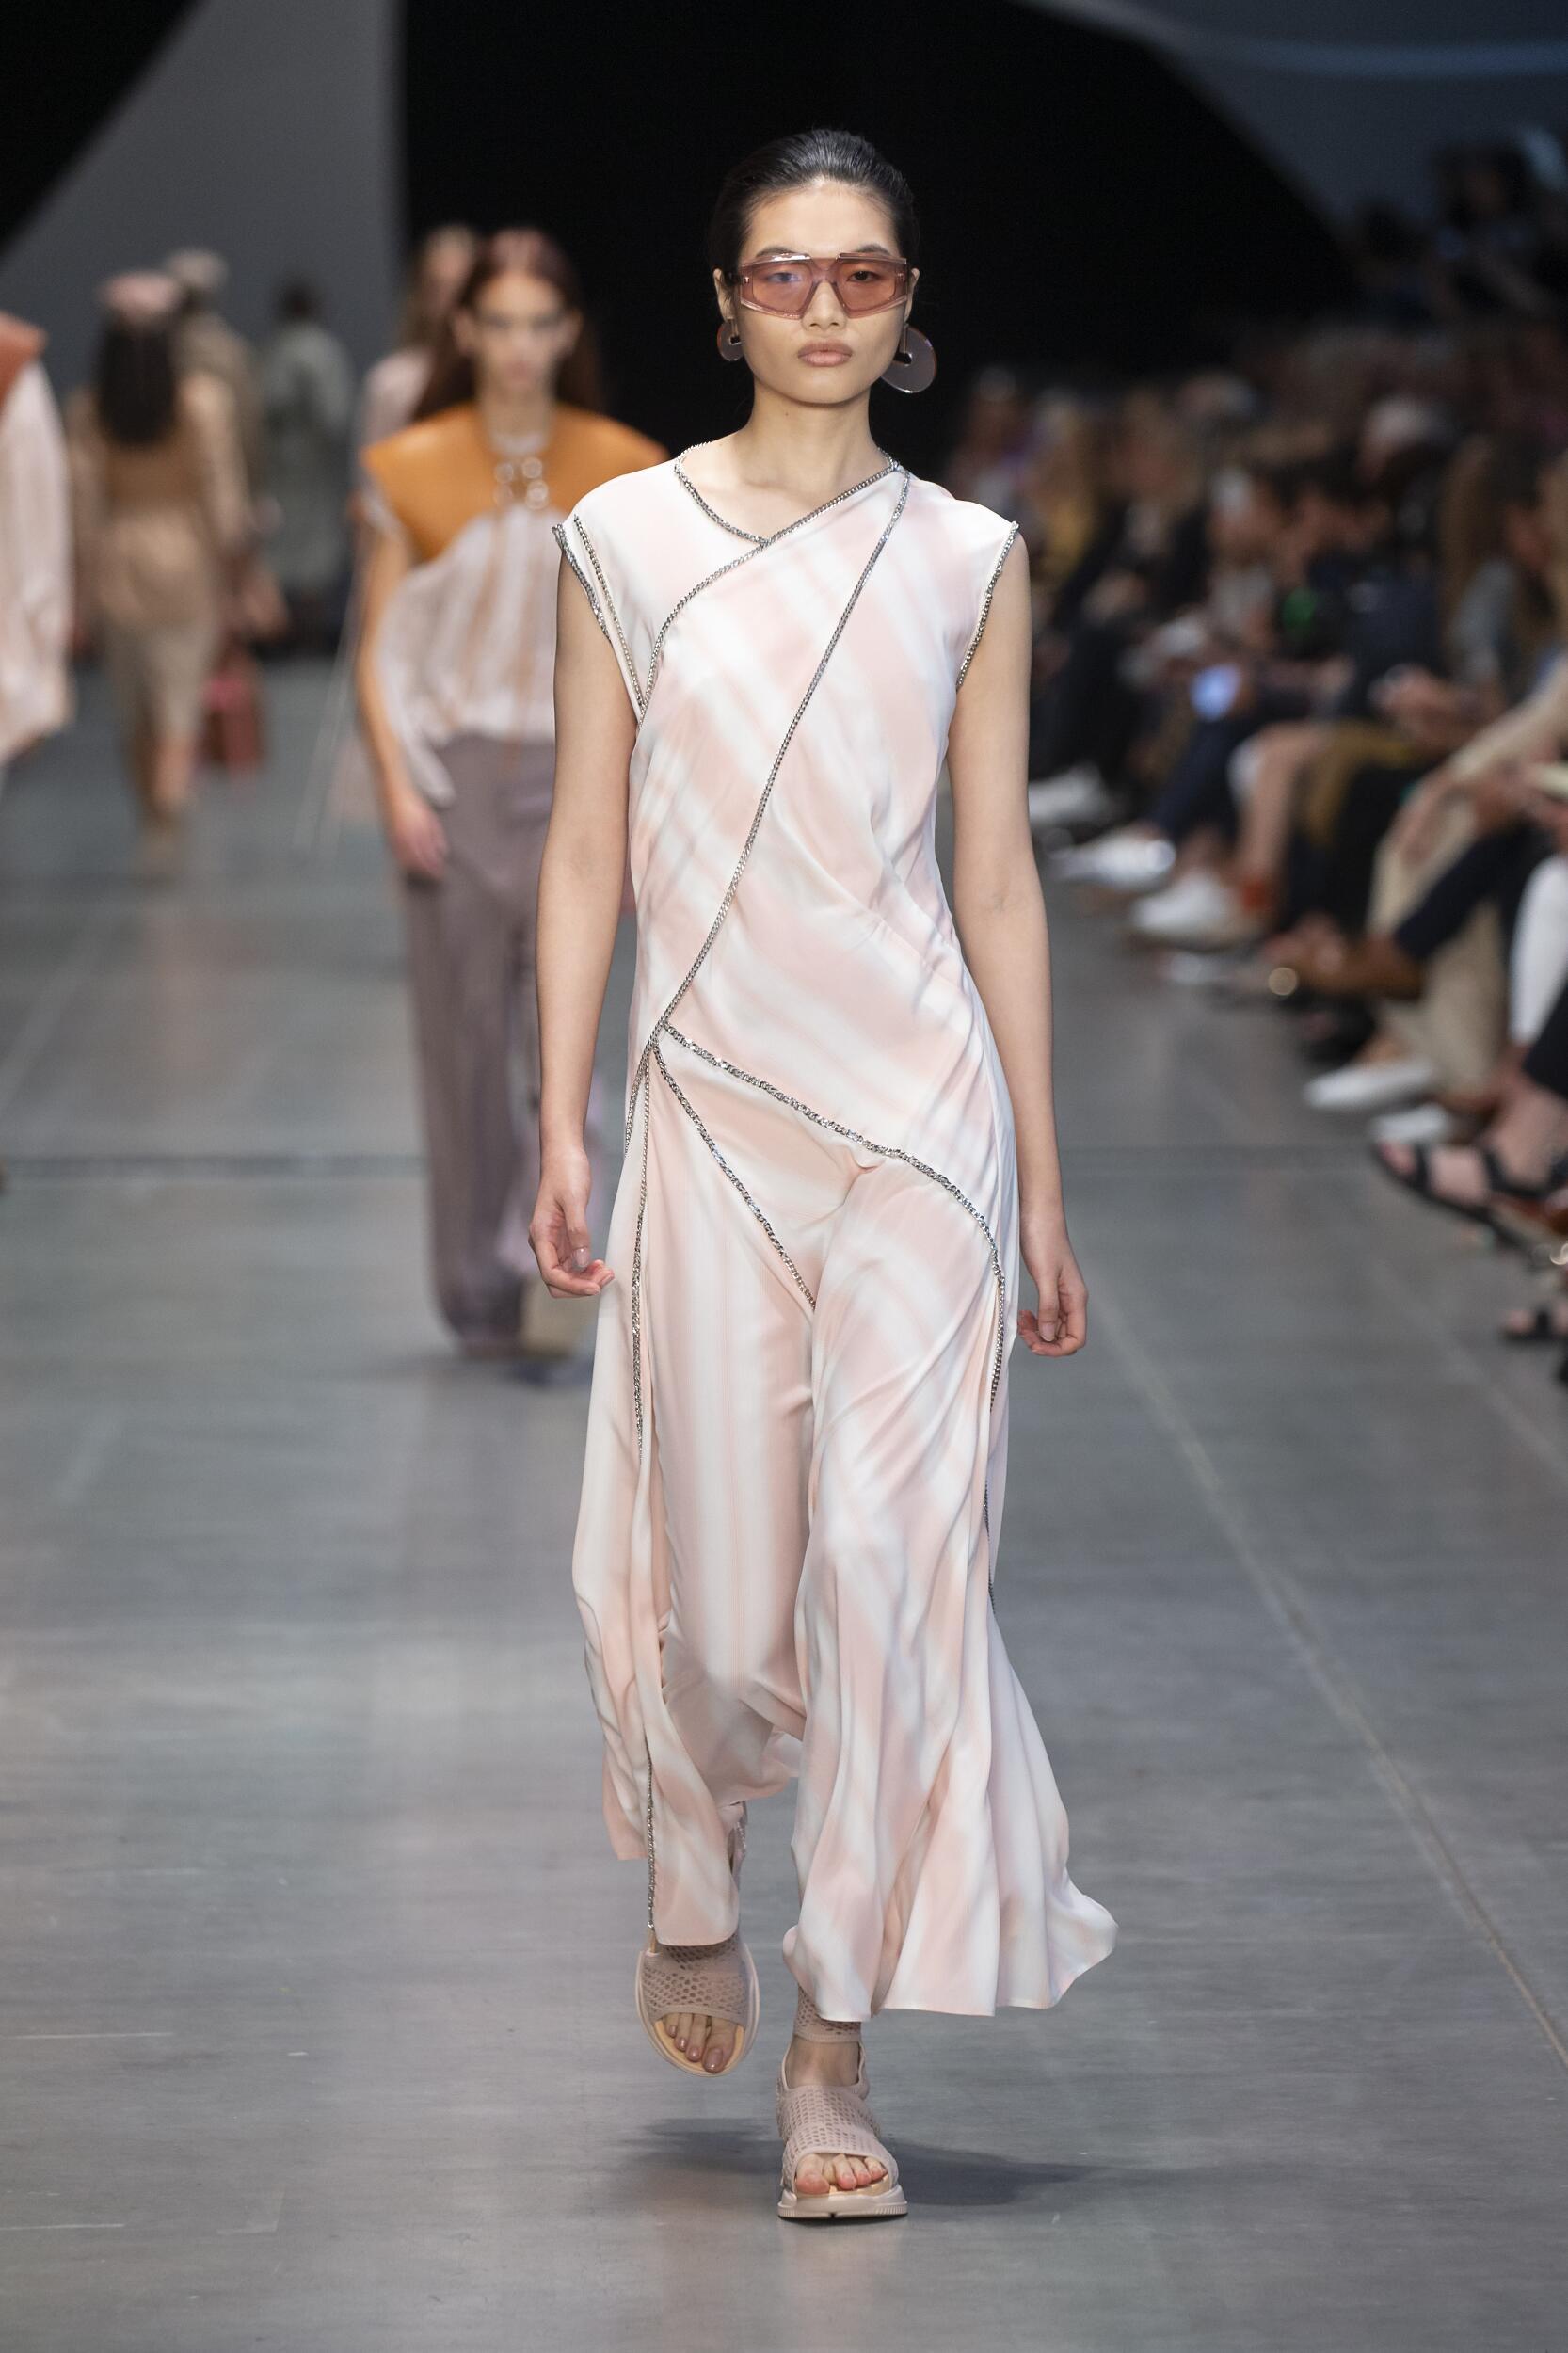 SS 2020 Sportmax Fashion Show Milan